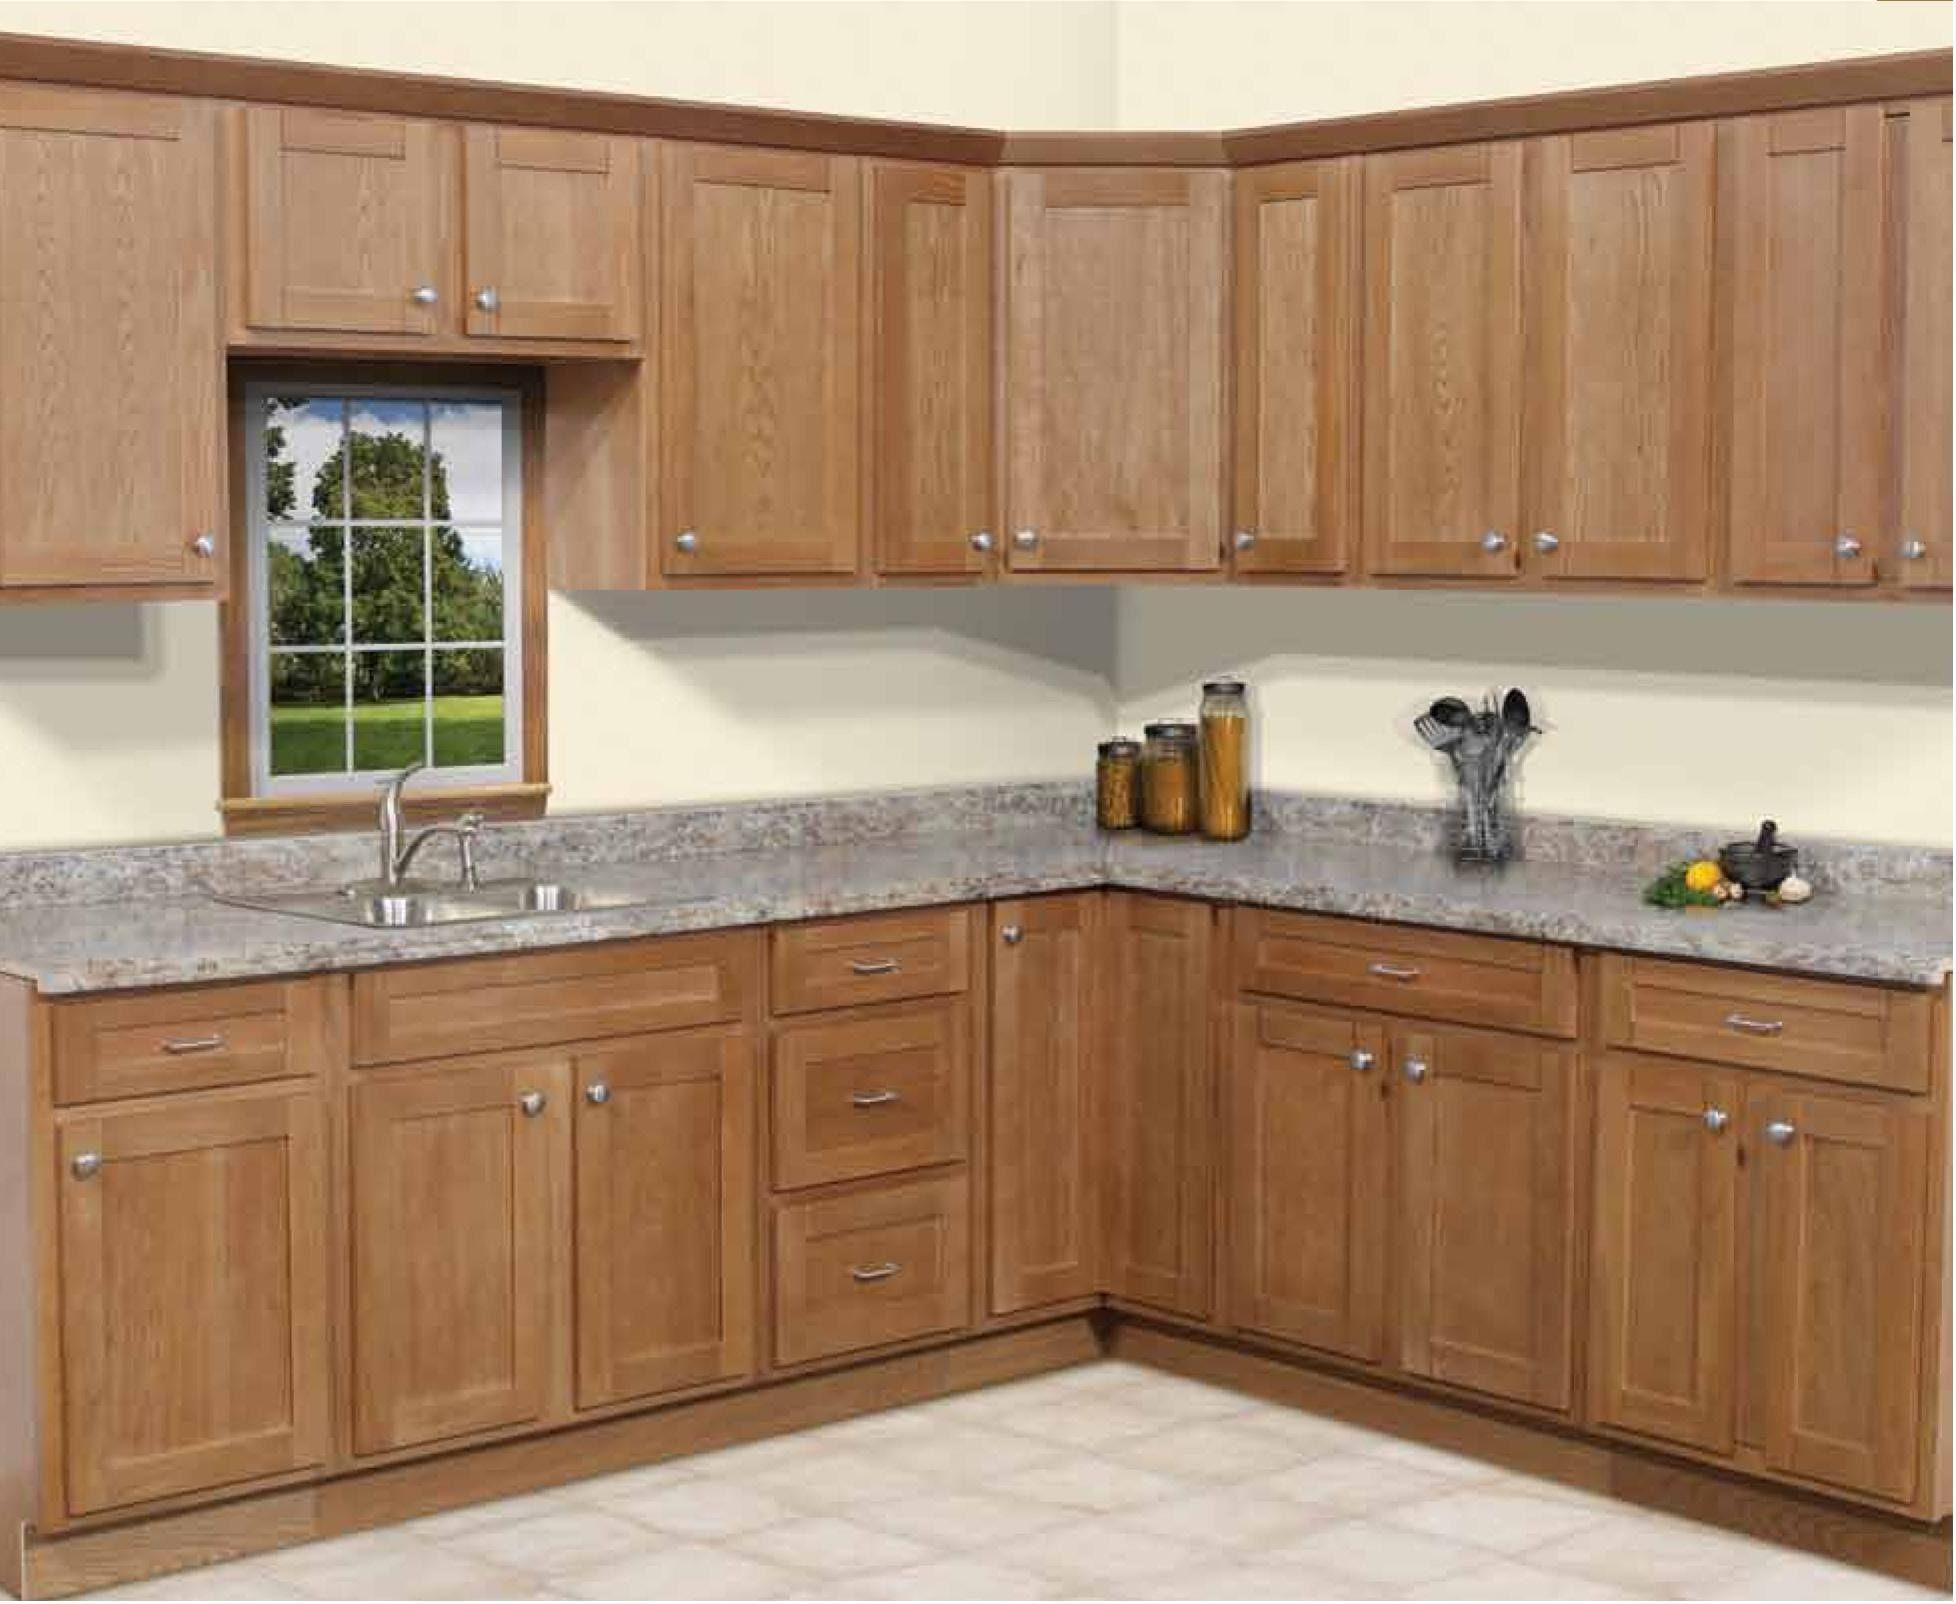 Pin by barney godoy on Muebles | Shaker style kitchen ...